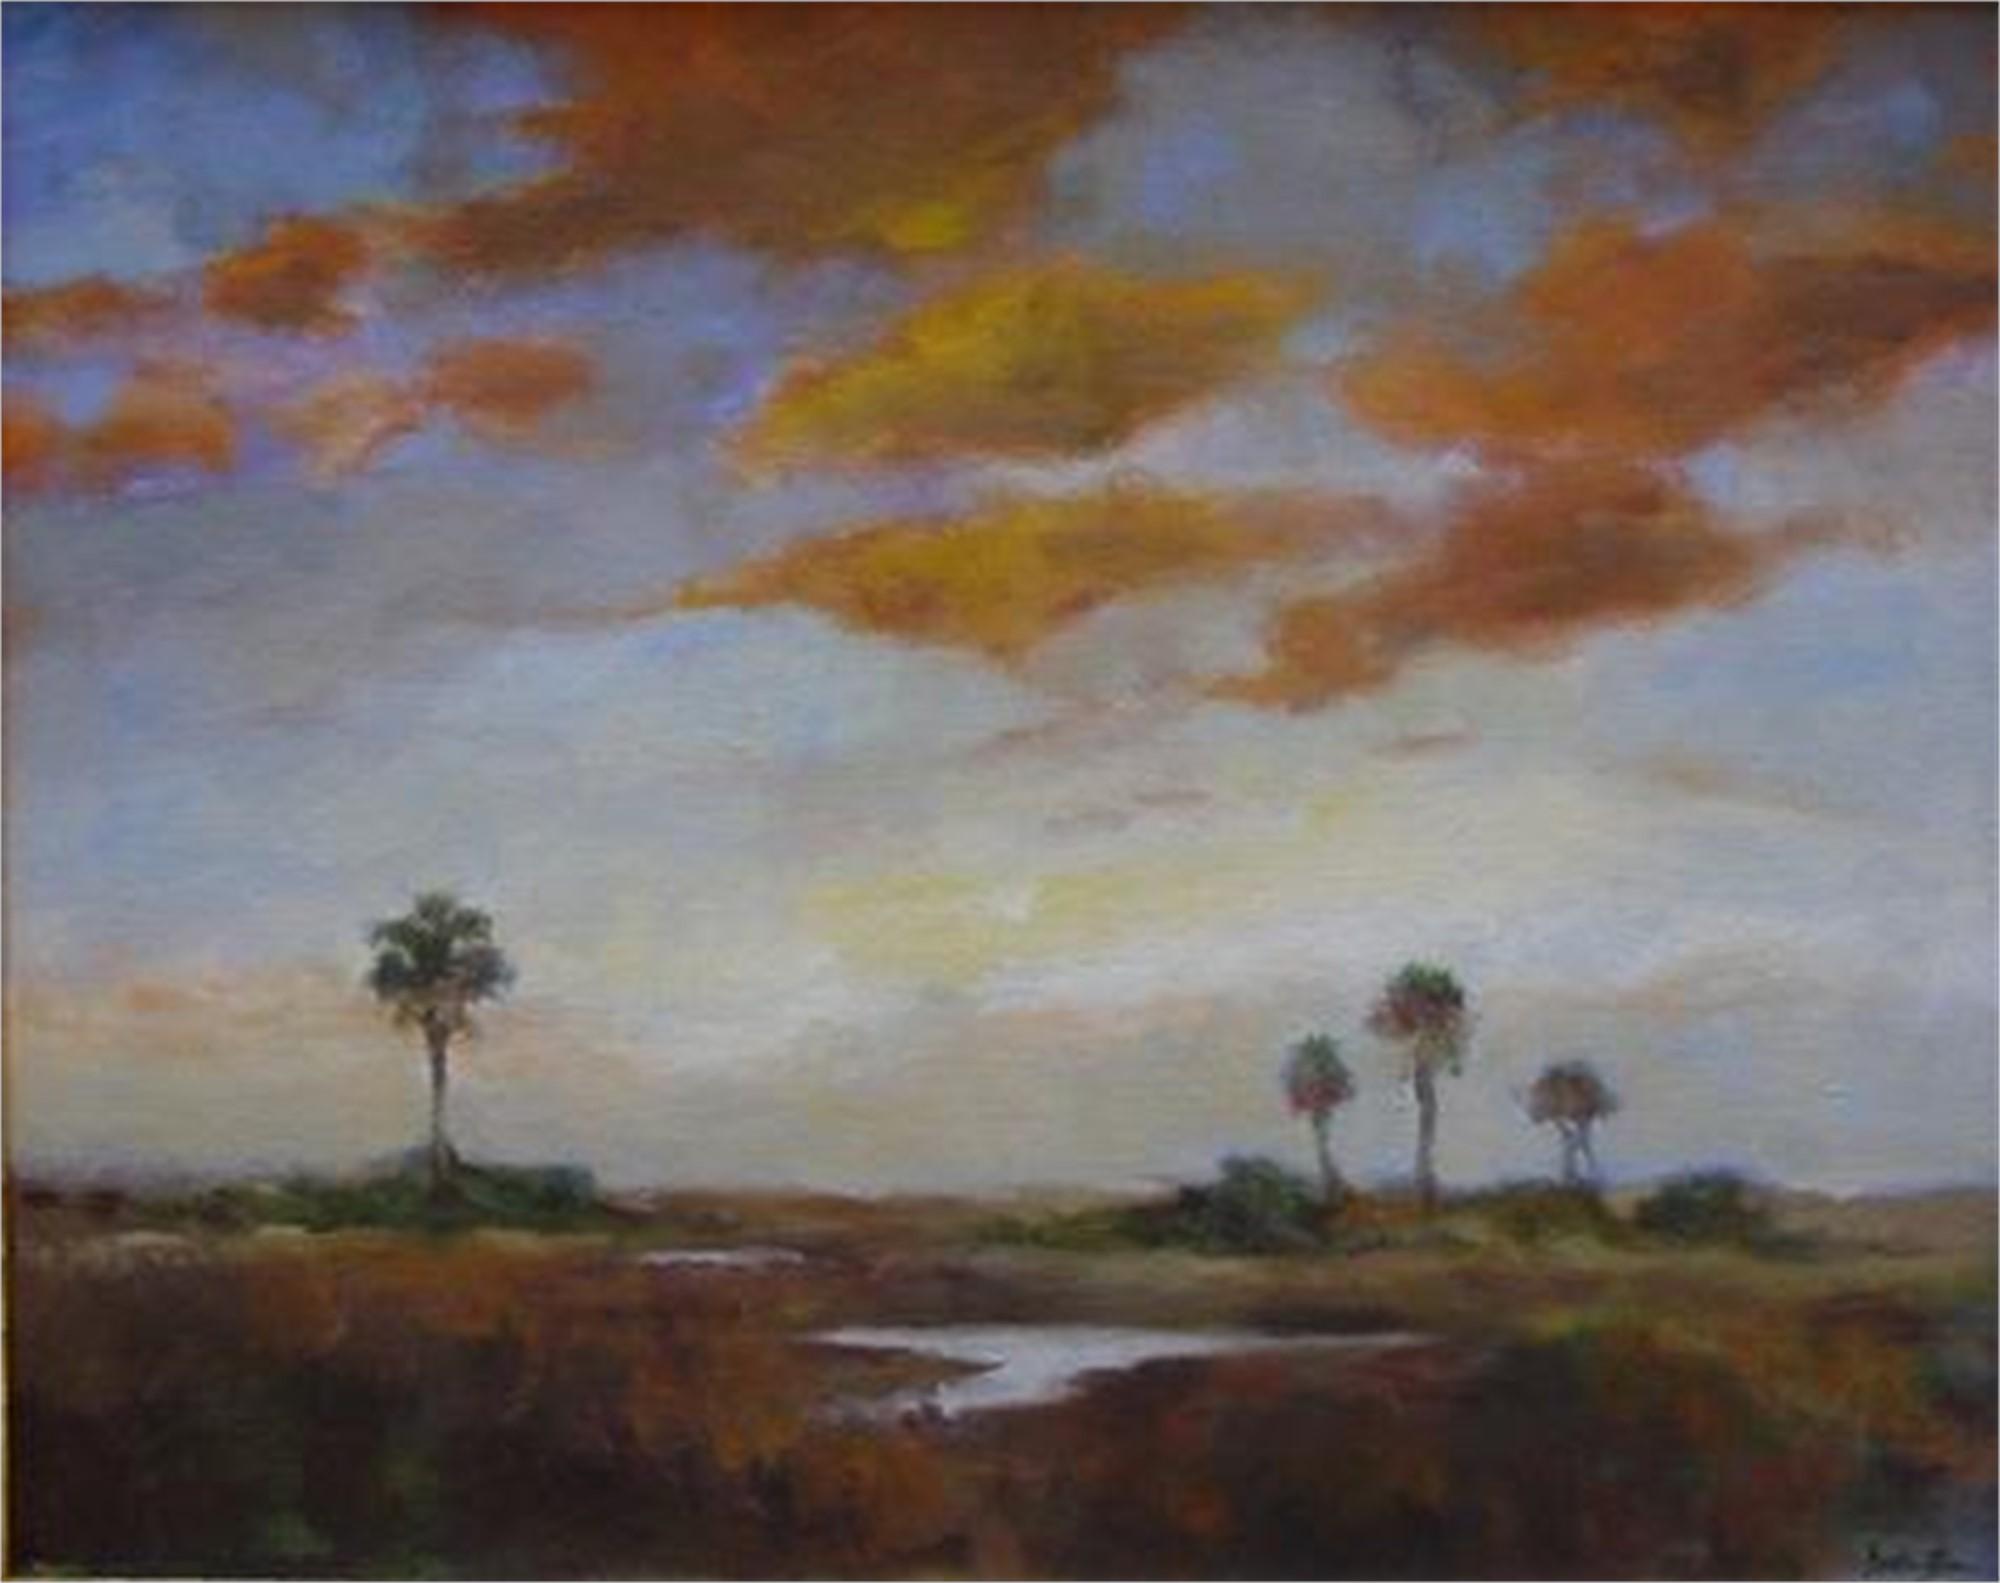 Orange Clouds Over Marsh by Jim Darlington